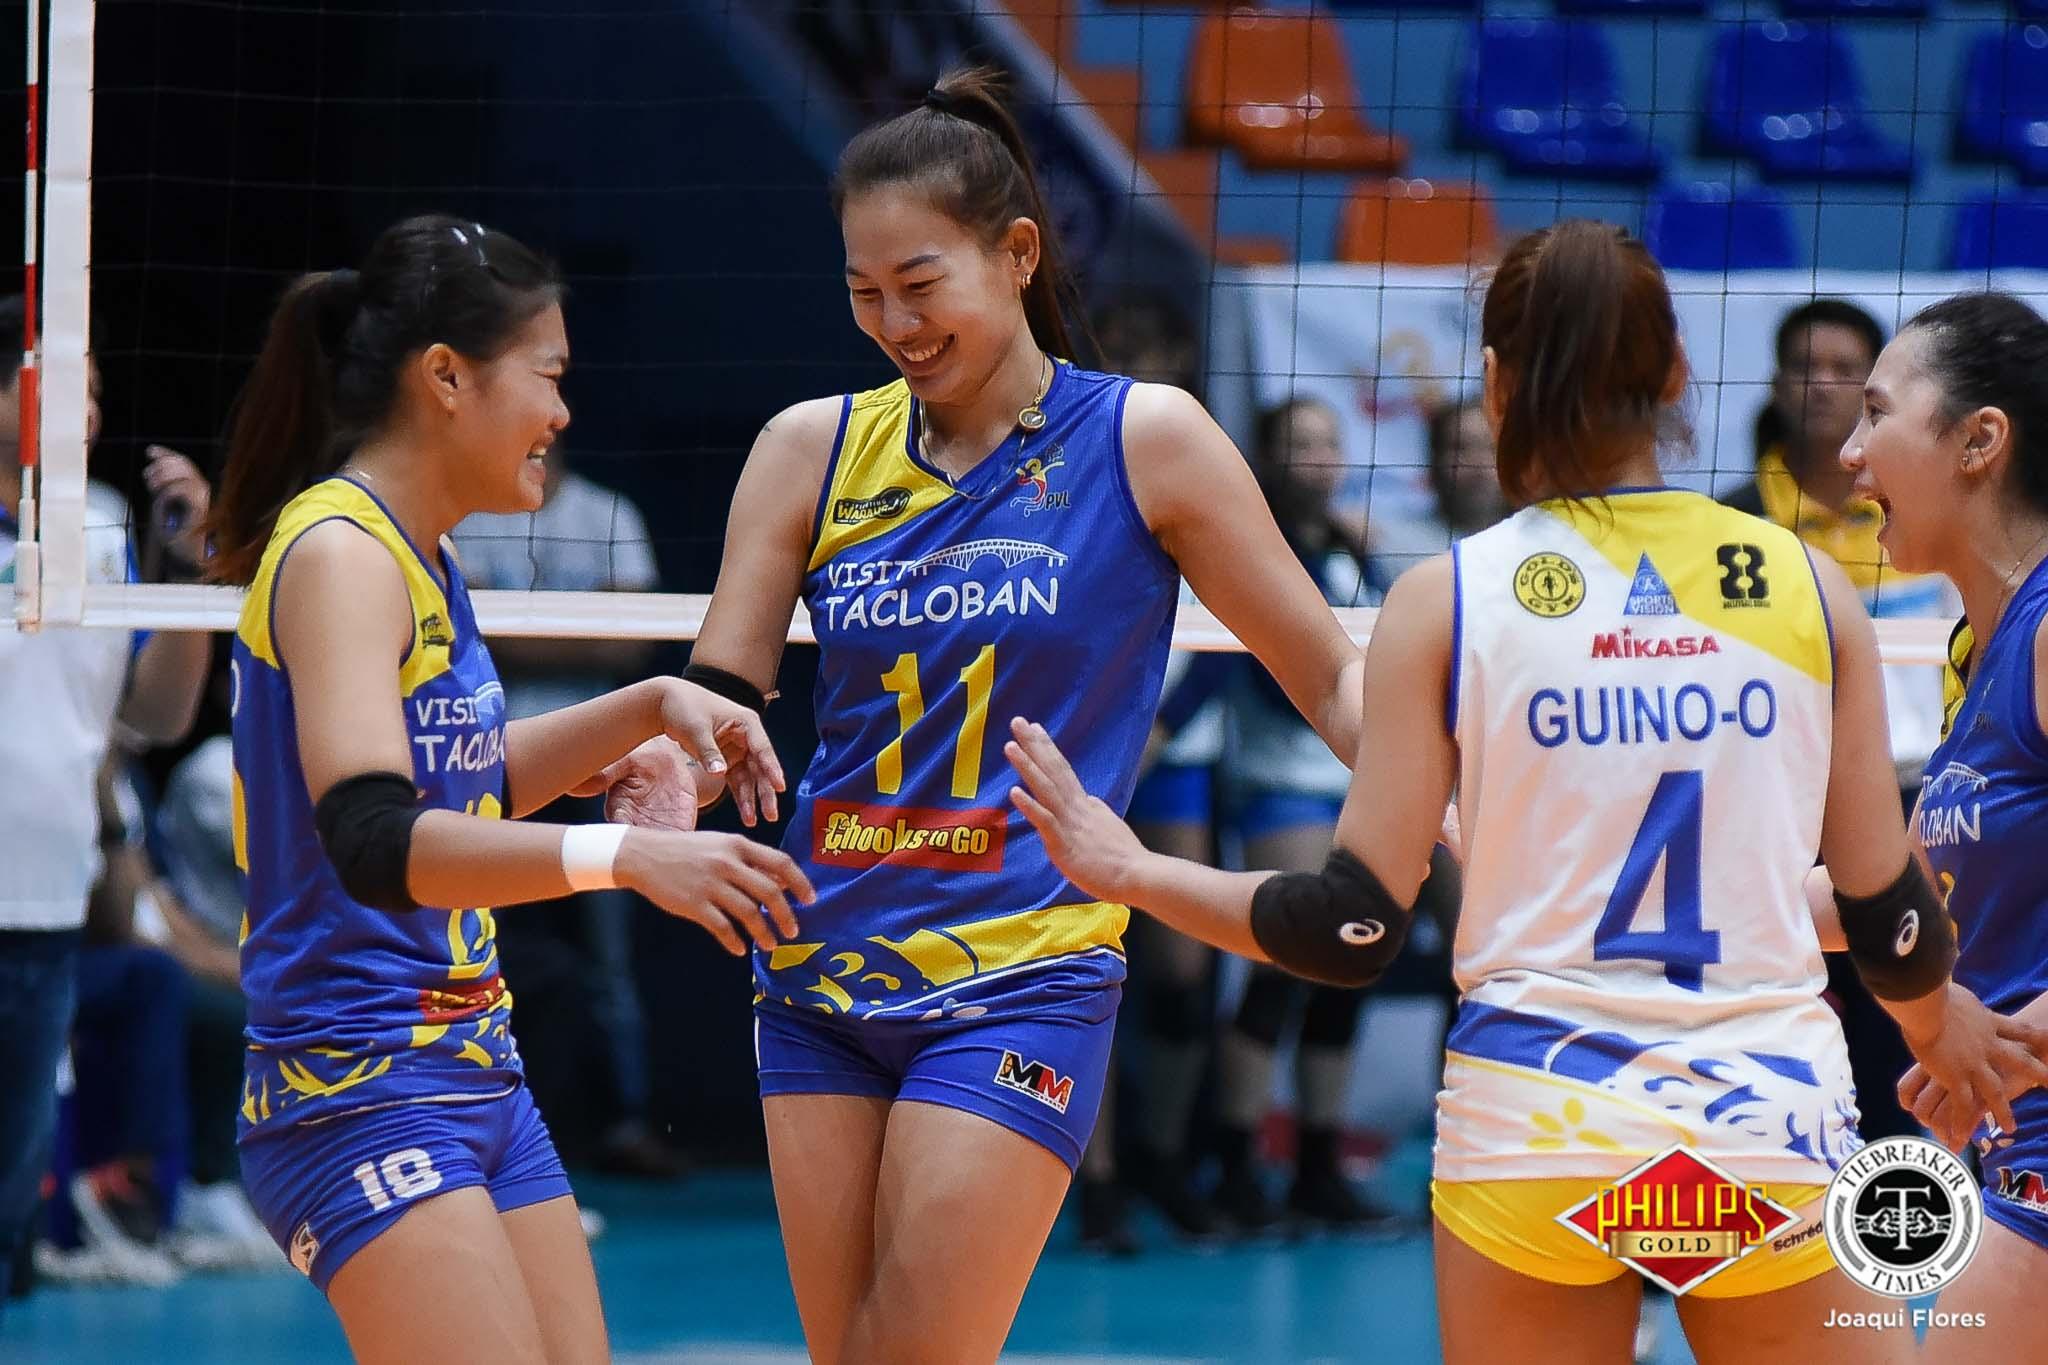 Tiebreaker Times Chooks-to-Go breaks silence on Fighting Warays rumor News PVL Volleyball  Tacloban Fighting Warays Chooks-to-Go 2018 PVL Women's Reinforced Conference 2018 PVL Season